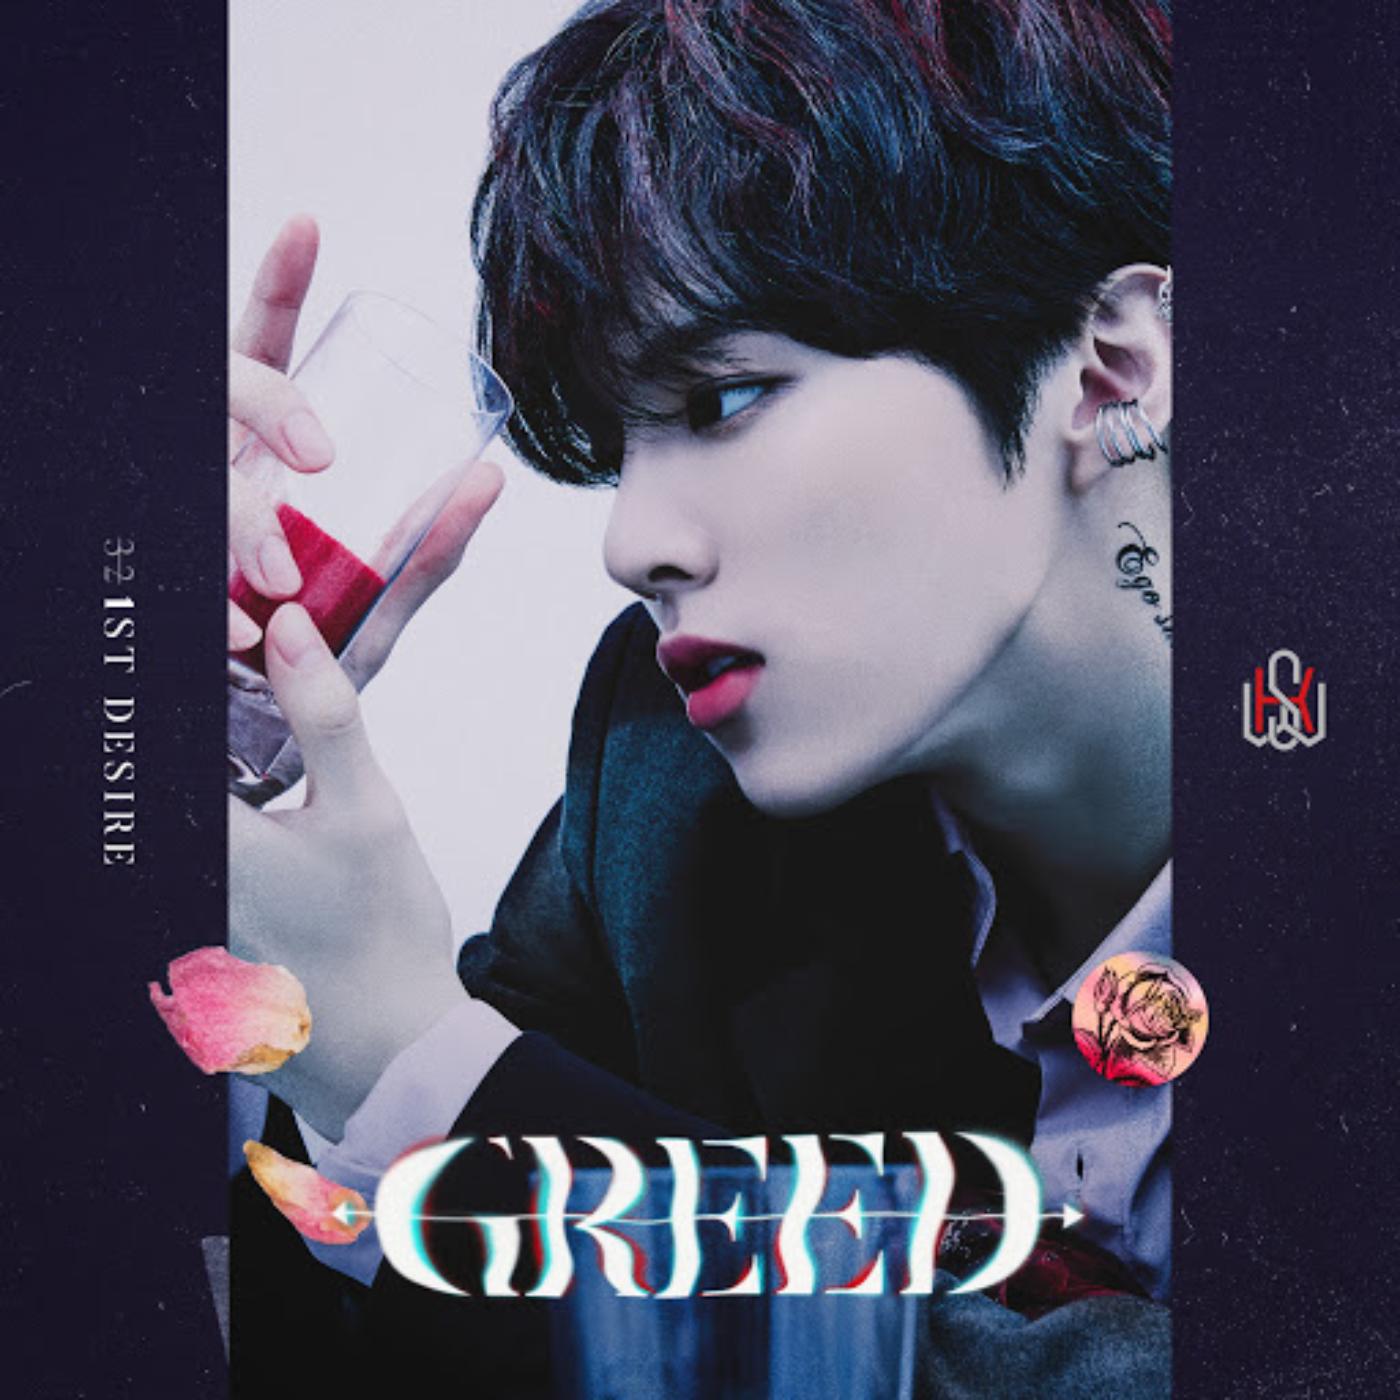 1st Desire Greed